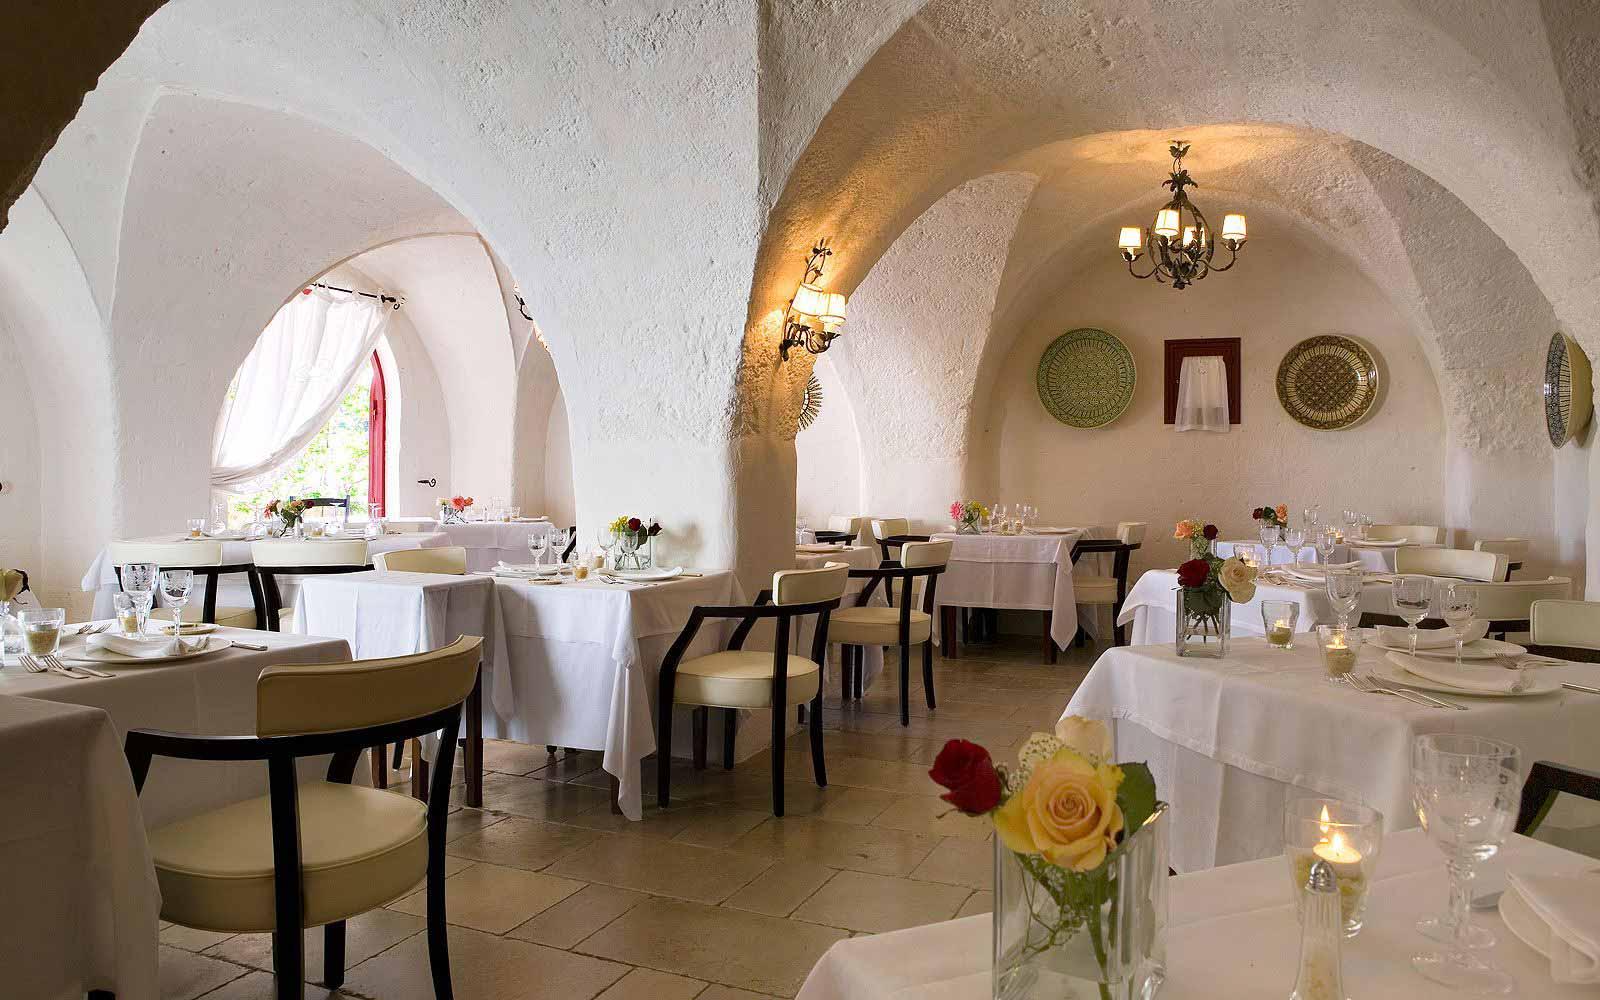 Restaurant at Masseria Torre Coccaro